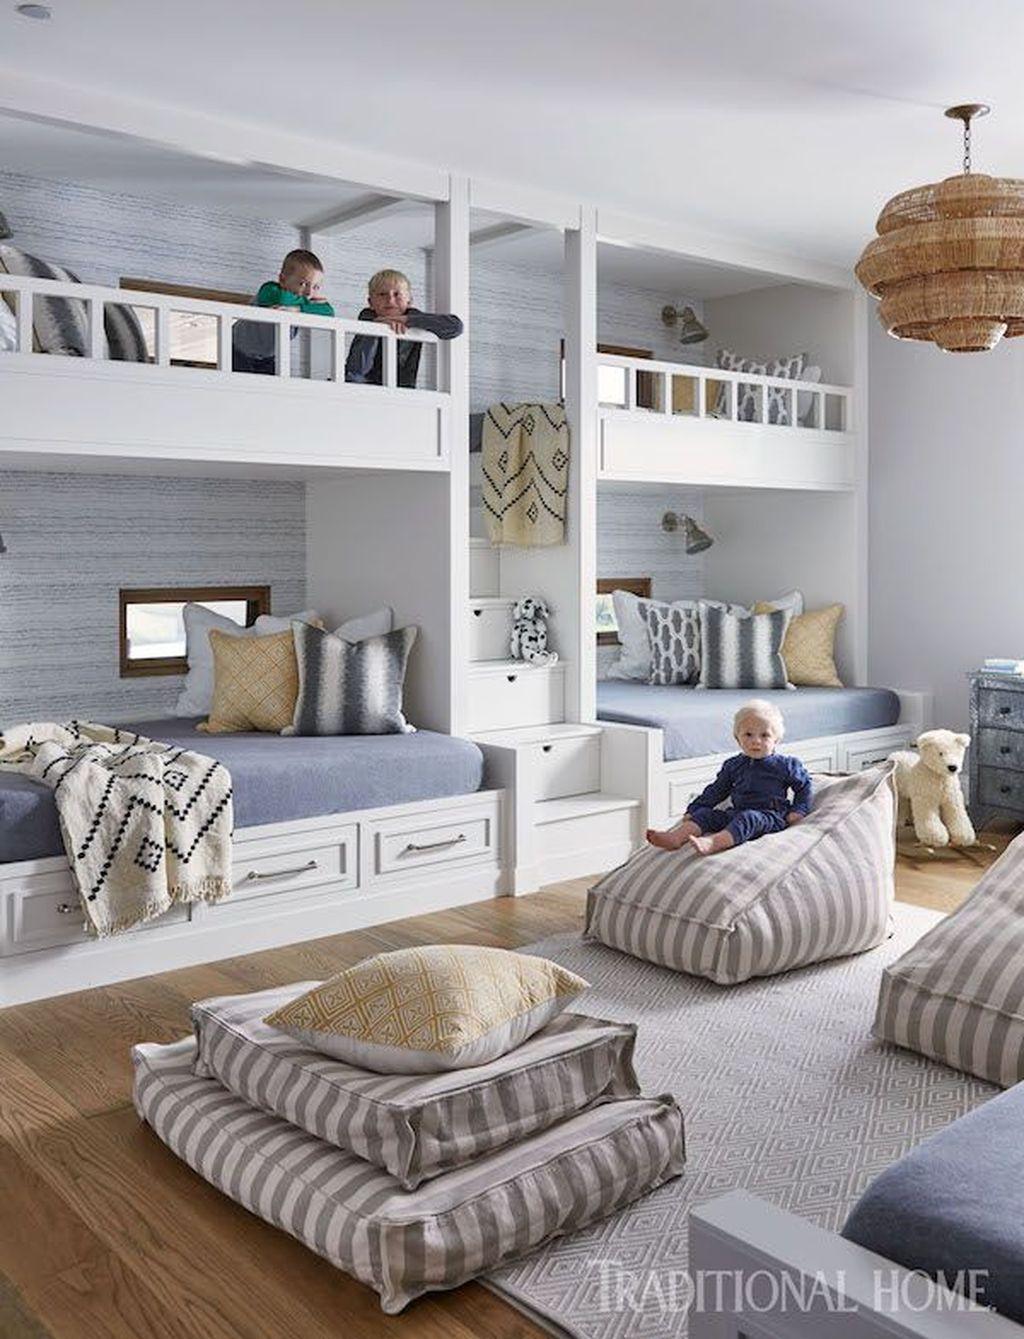 Admirable Beach House Decor Ideas You Should Copy 26